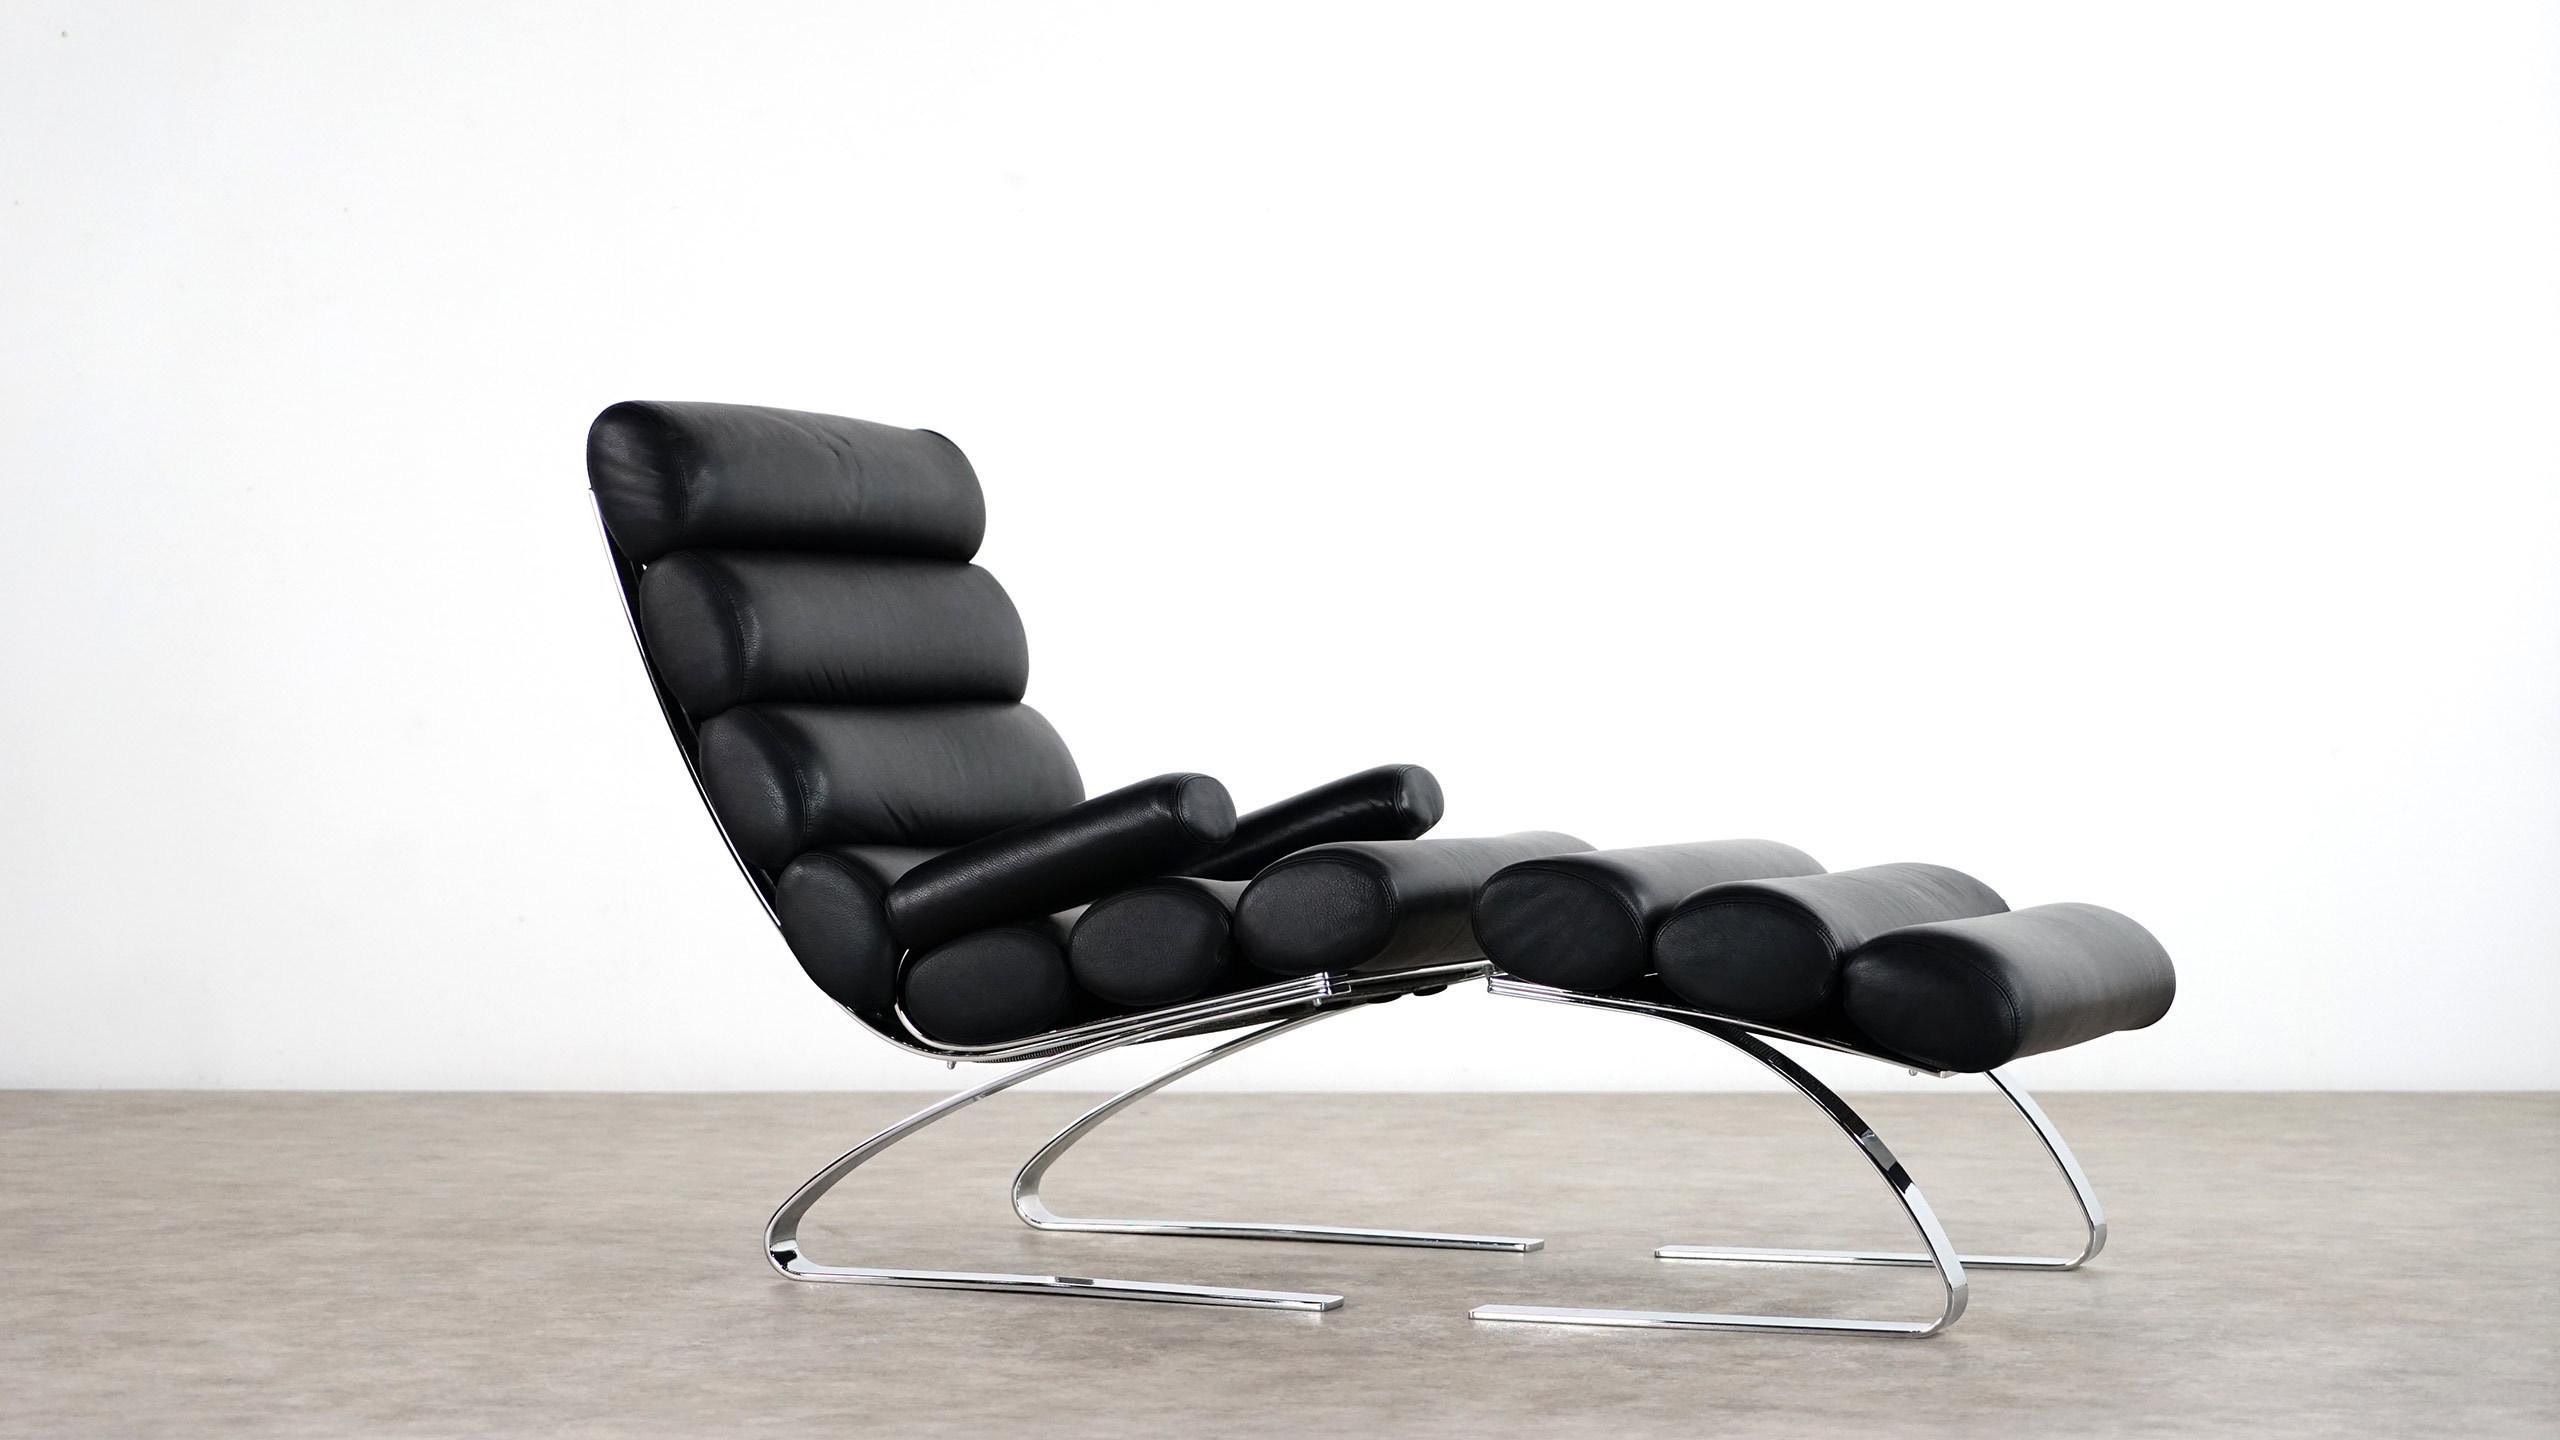 cor sinus lounge chair ottoman 1976. Black Bedroom Furniture Sets. Home Design Ideas